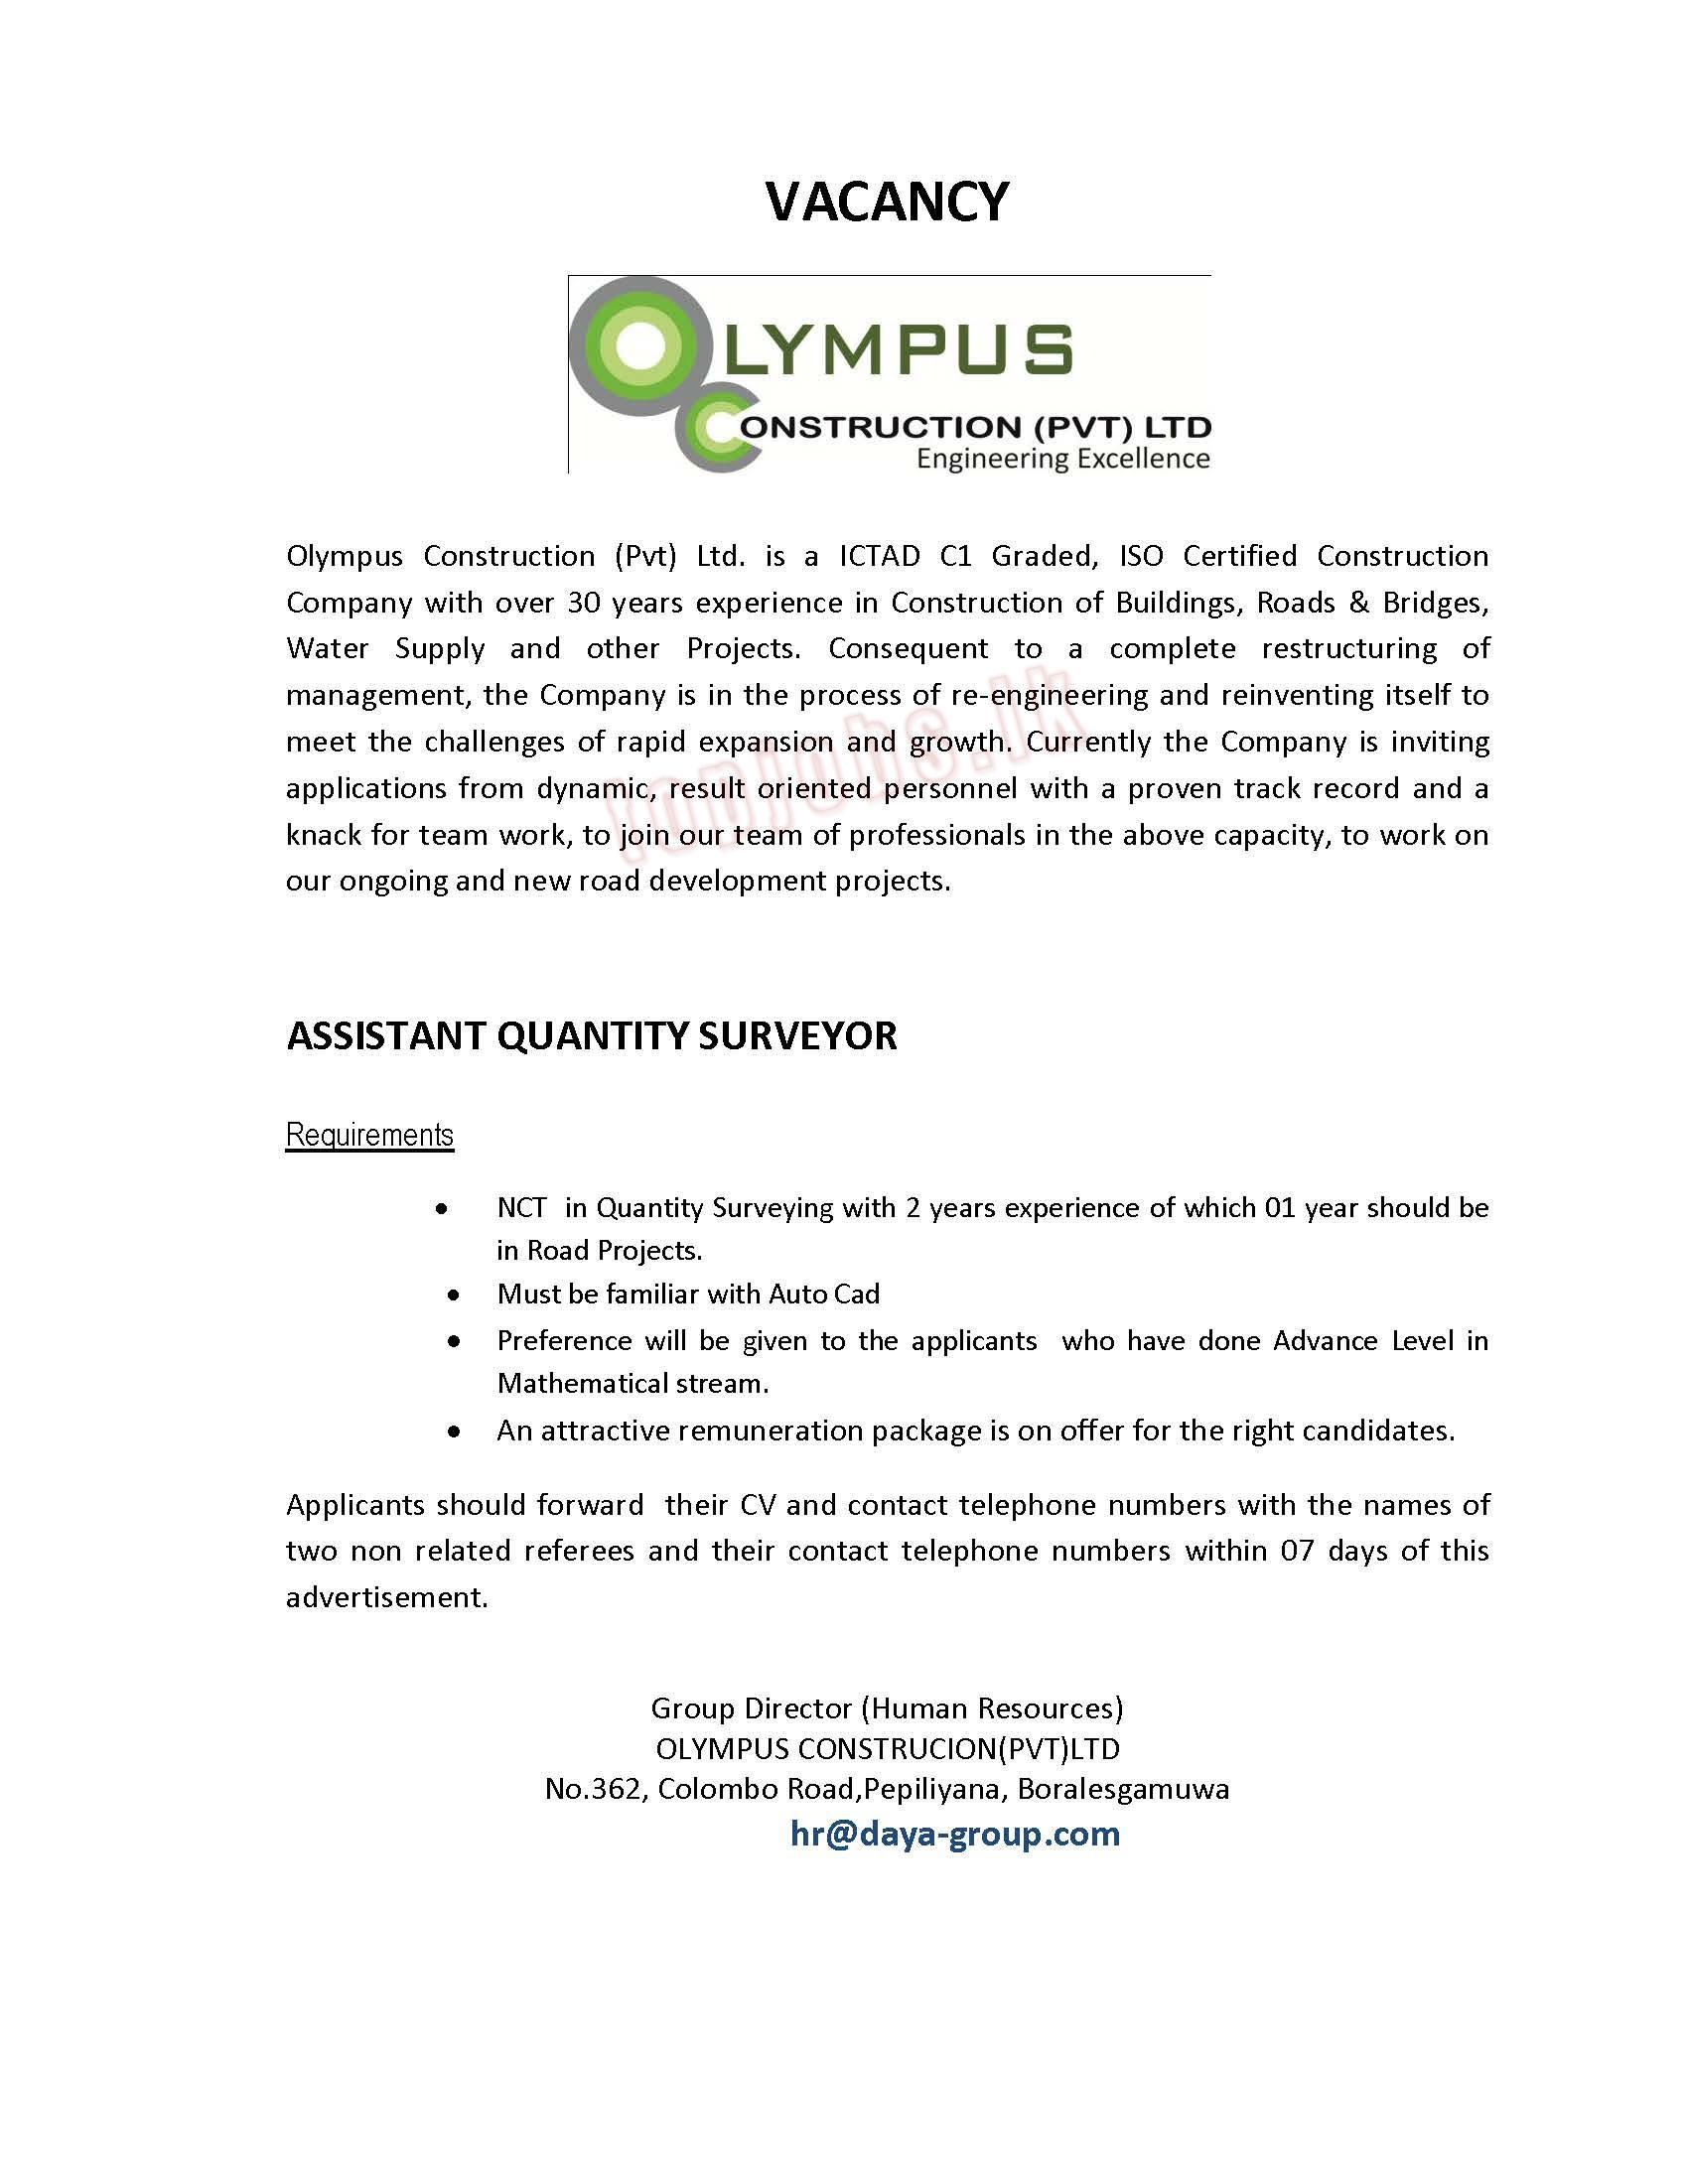 assistant quantity surveyor cv